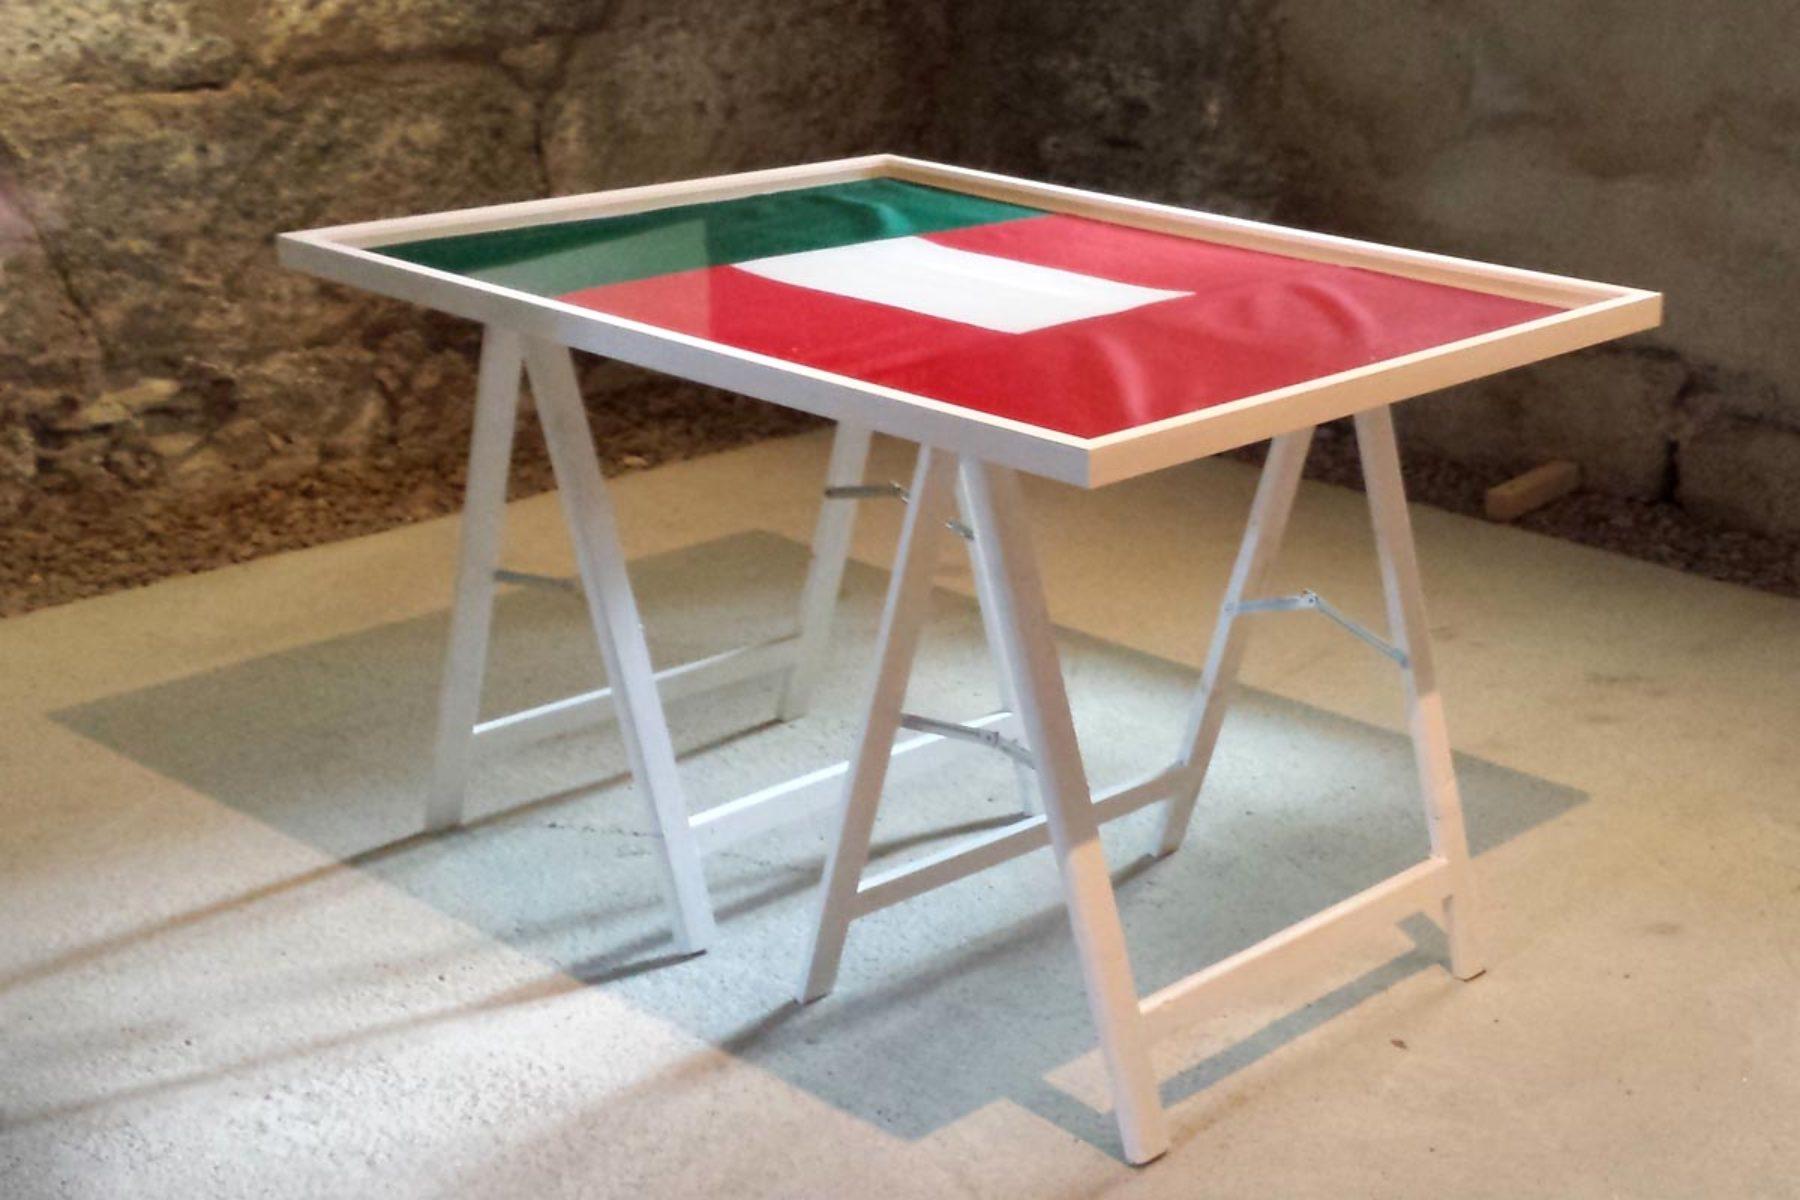 F. Lanaro, IT_A, 2013, sewn flags, frame, 70 x 100 cm